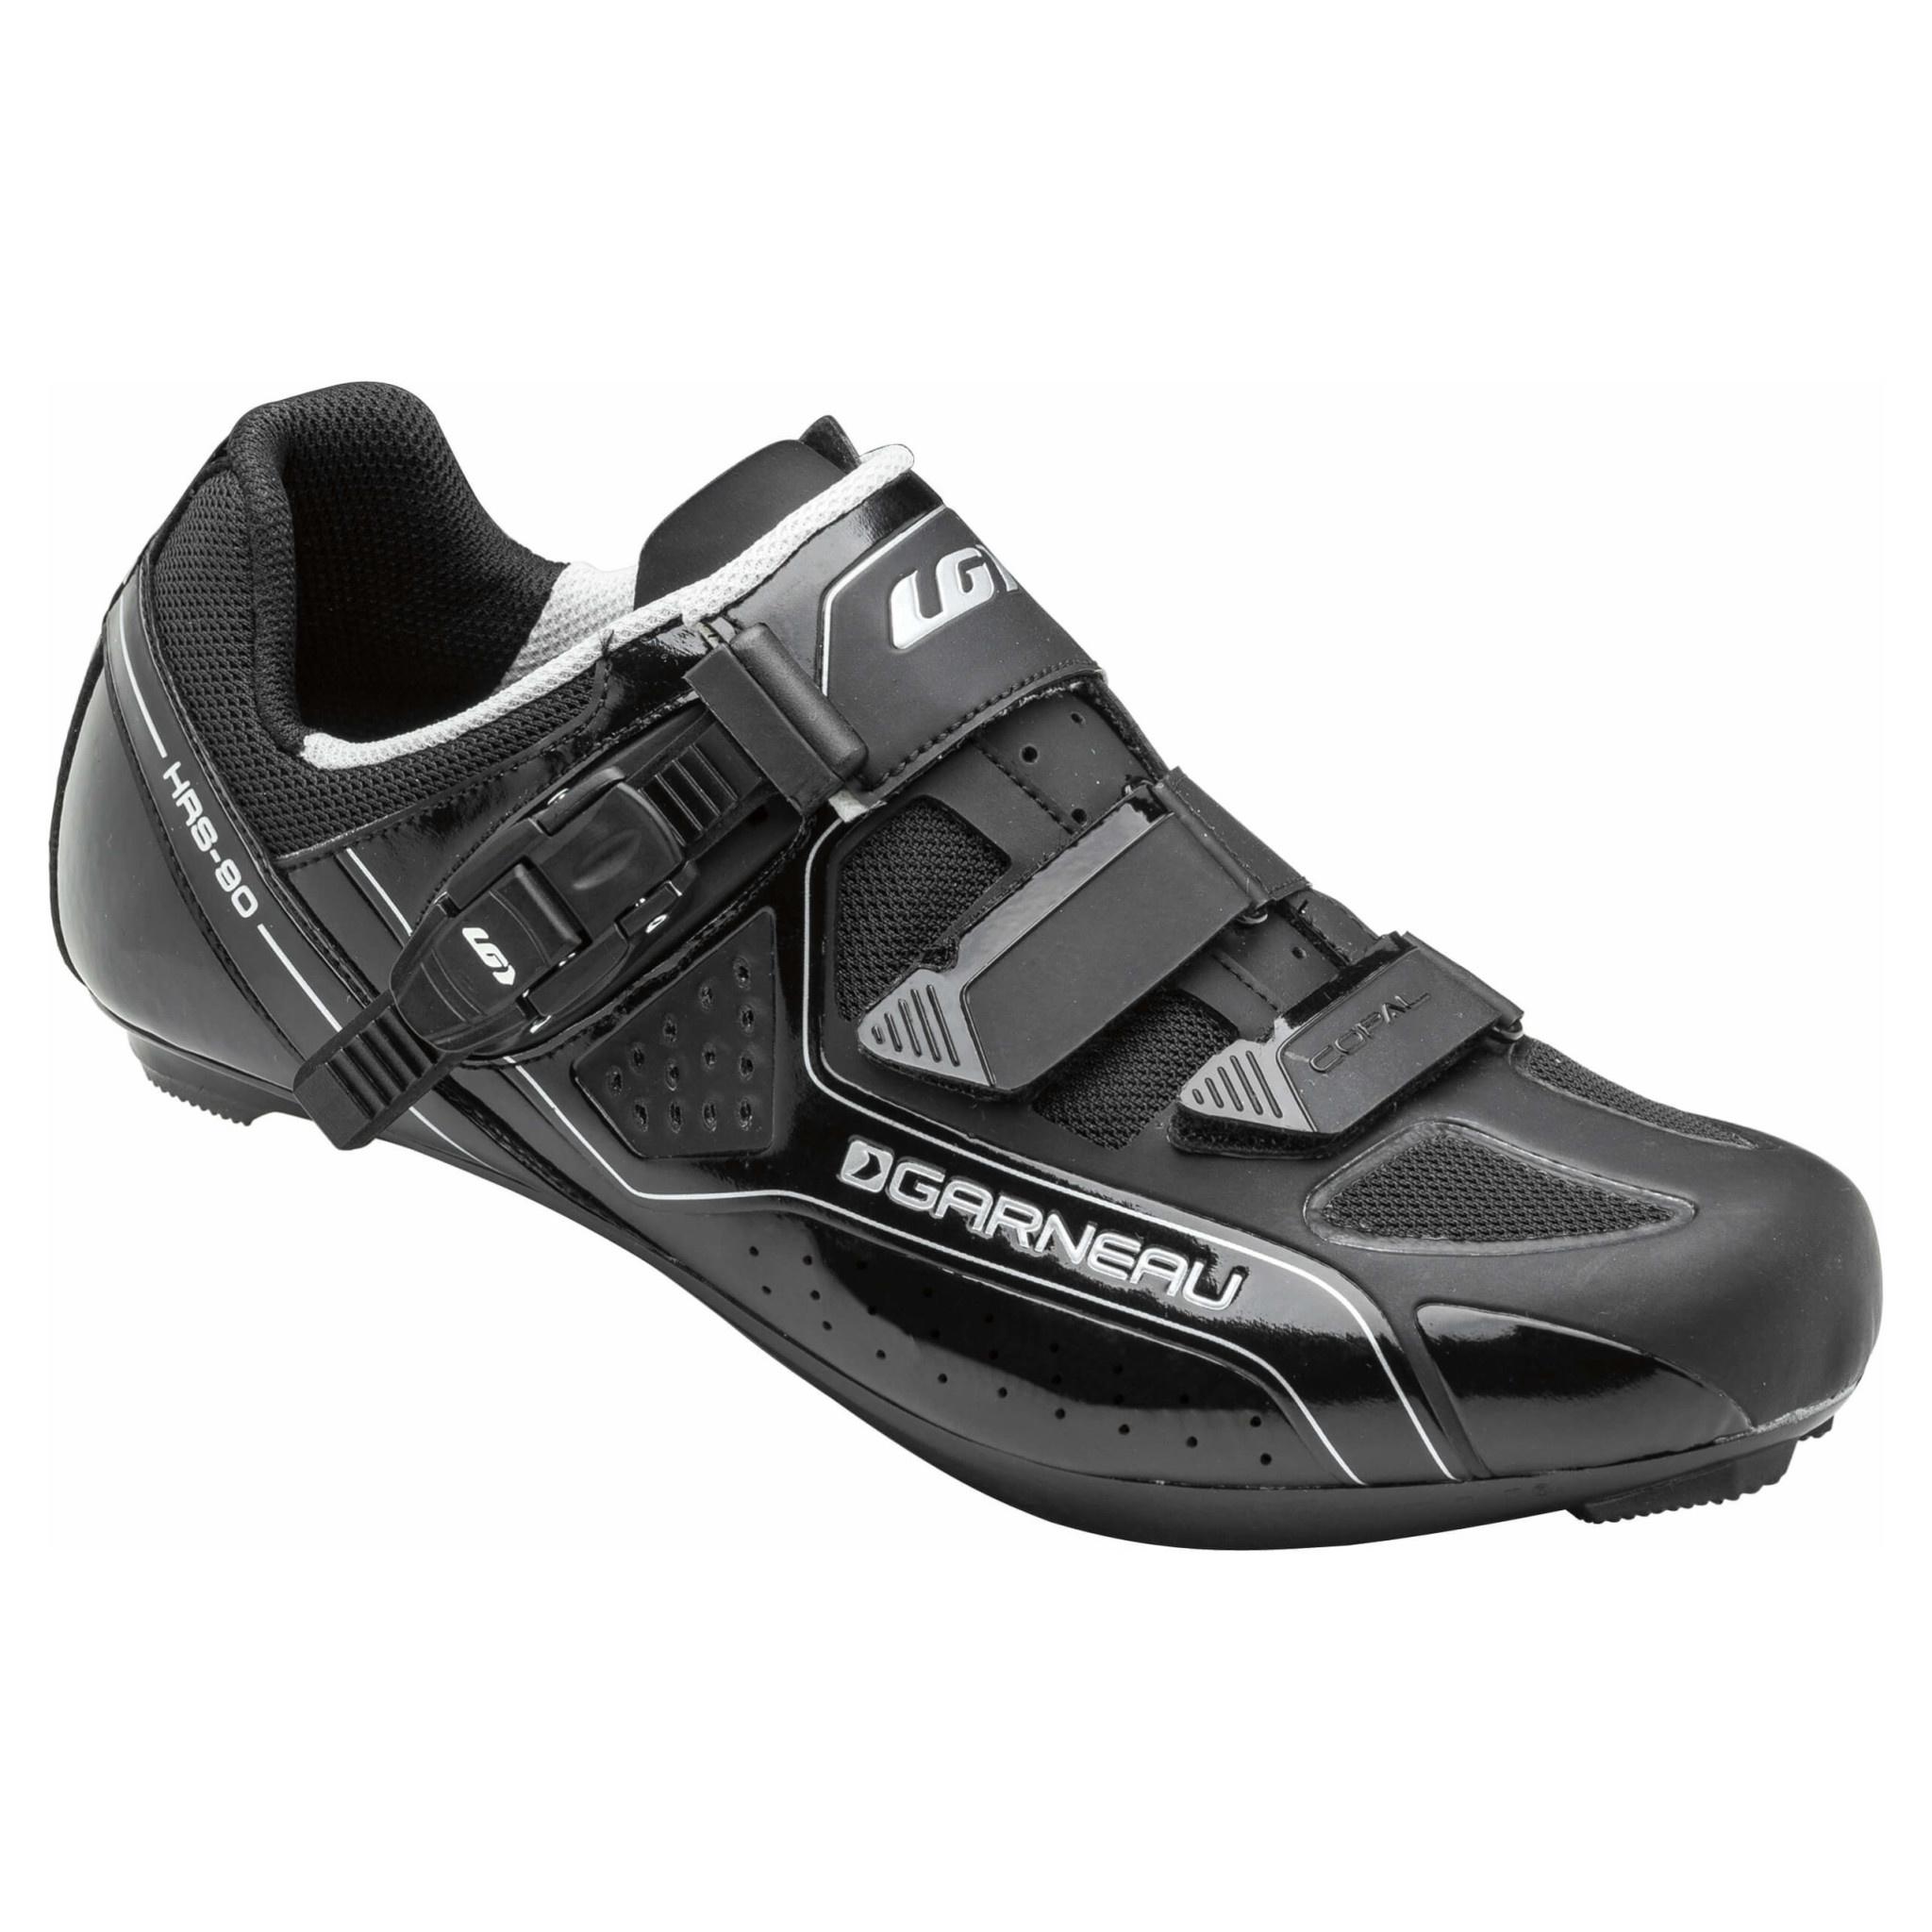 GARNEAU COPAL CYCLING SHOES NOIR BLACK 45